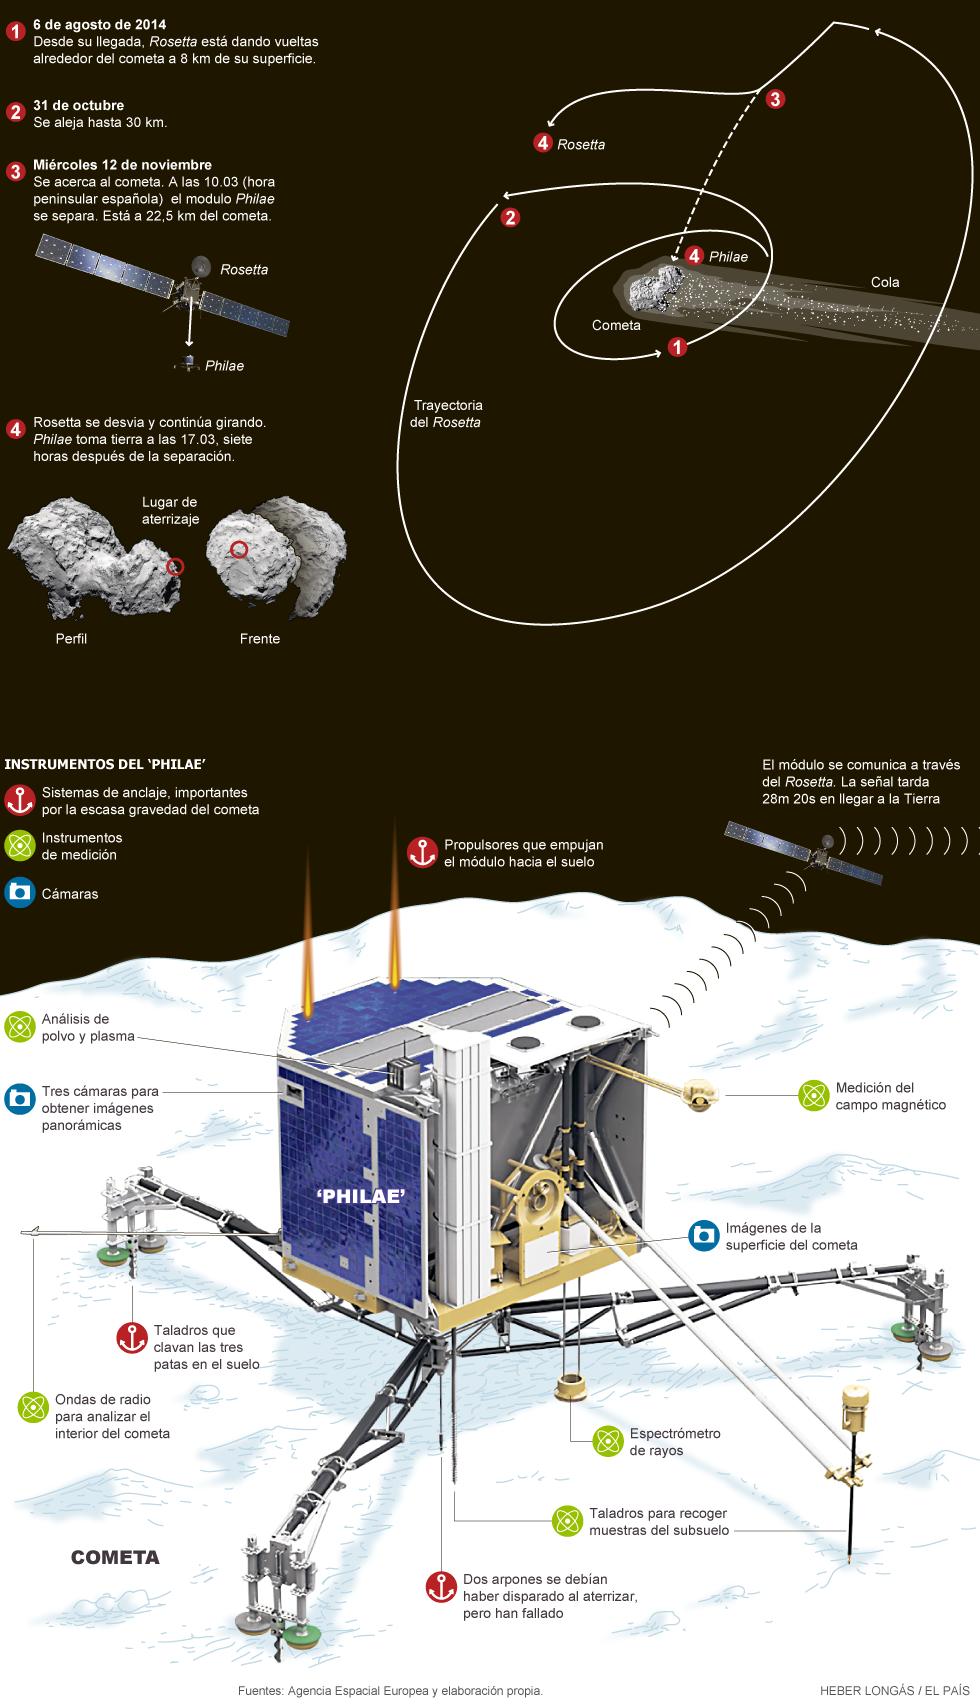 Aterrizaje en un cometa